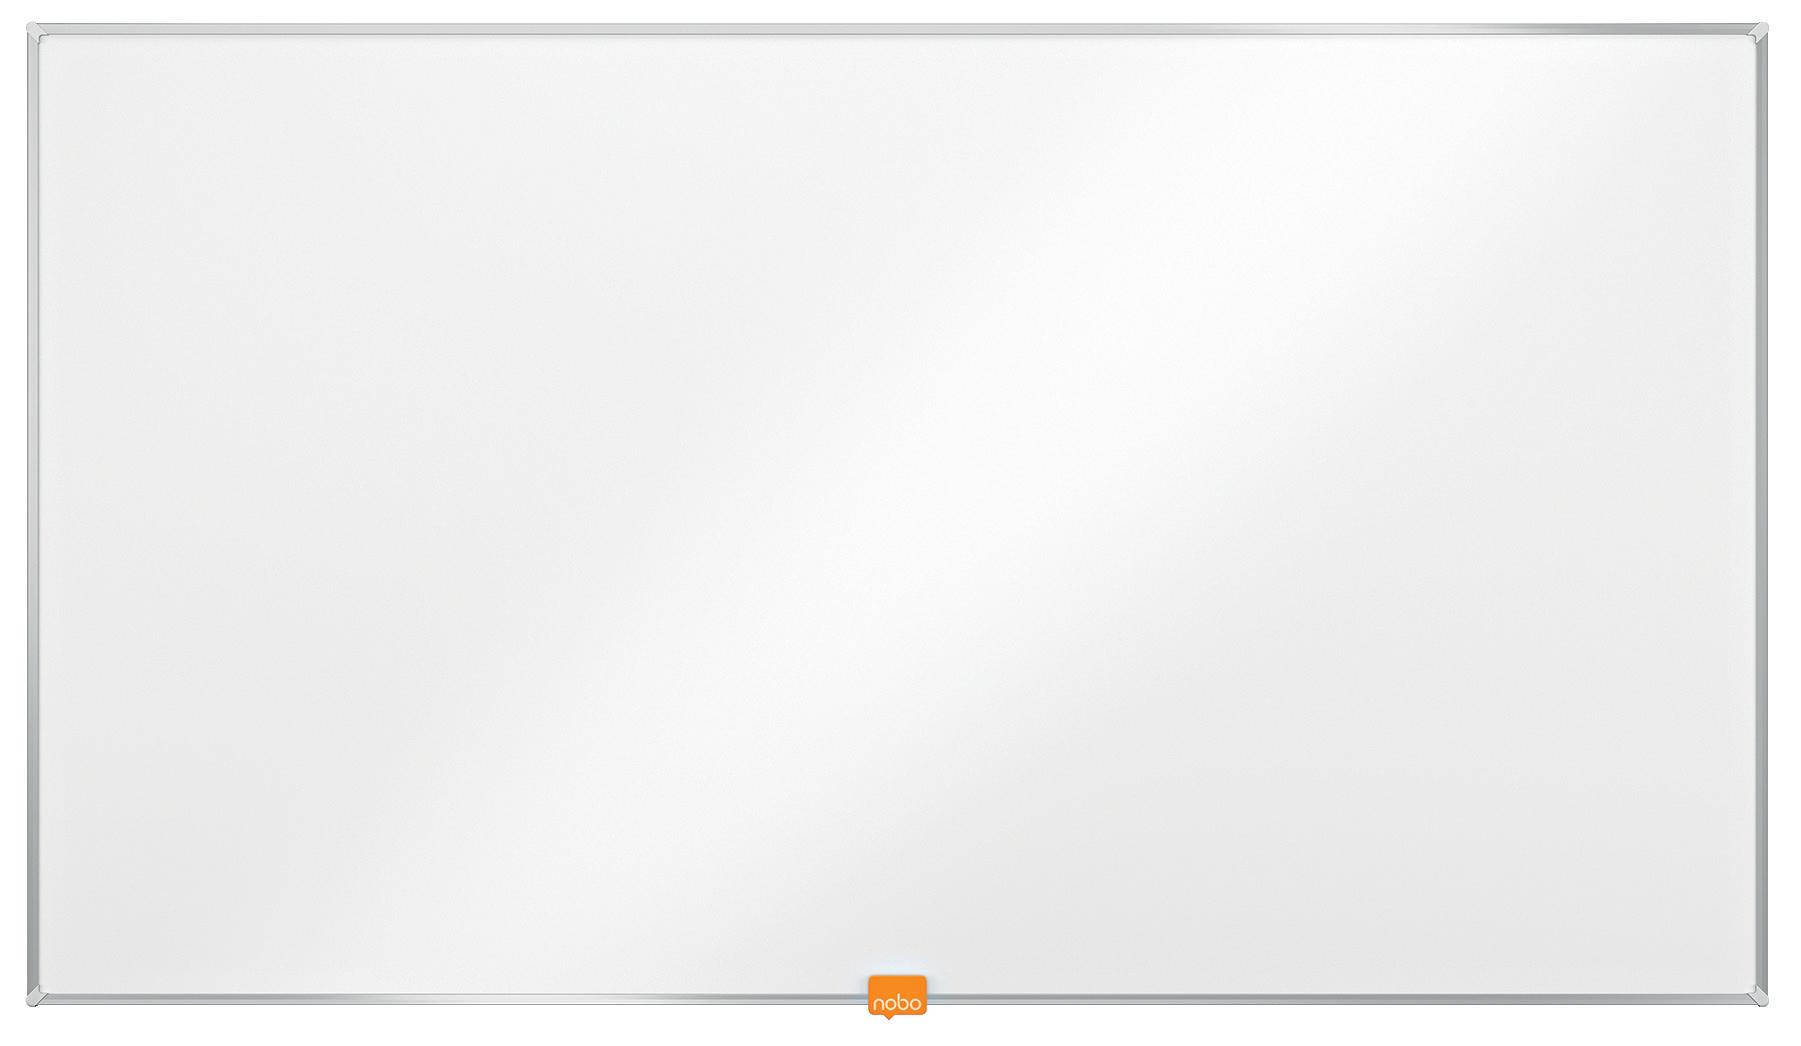 Lavagne bianche: quale materiale?